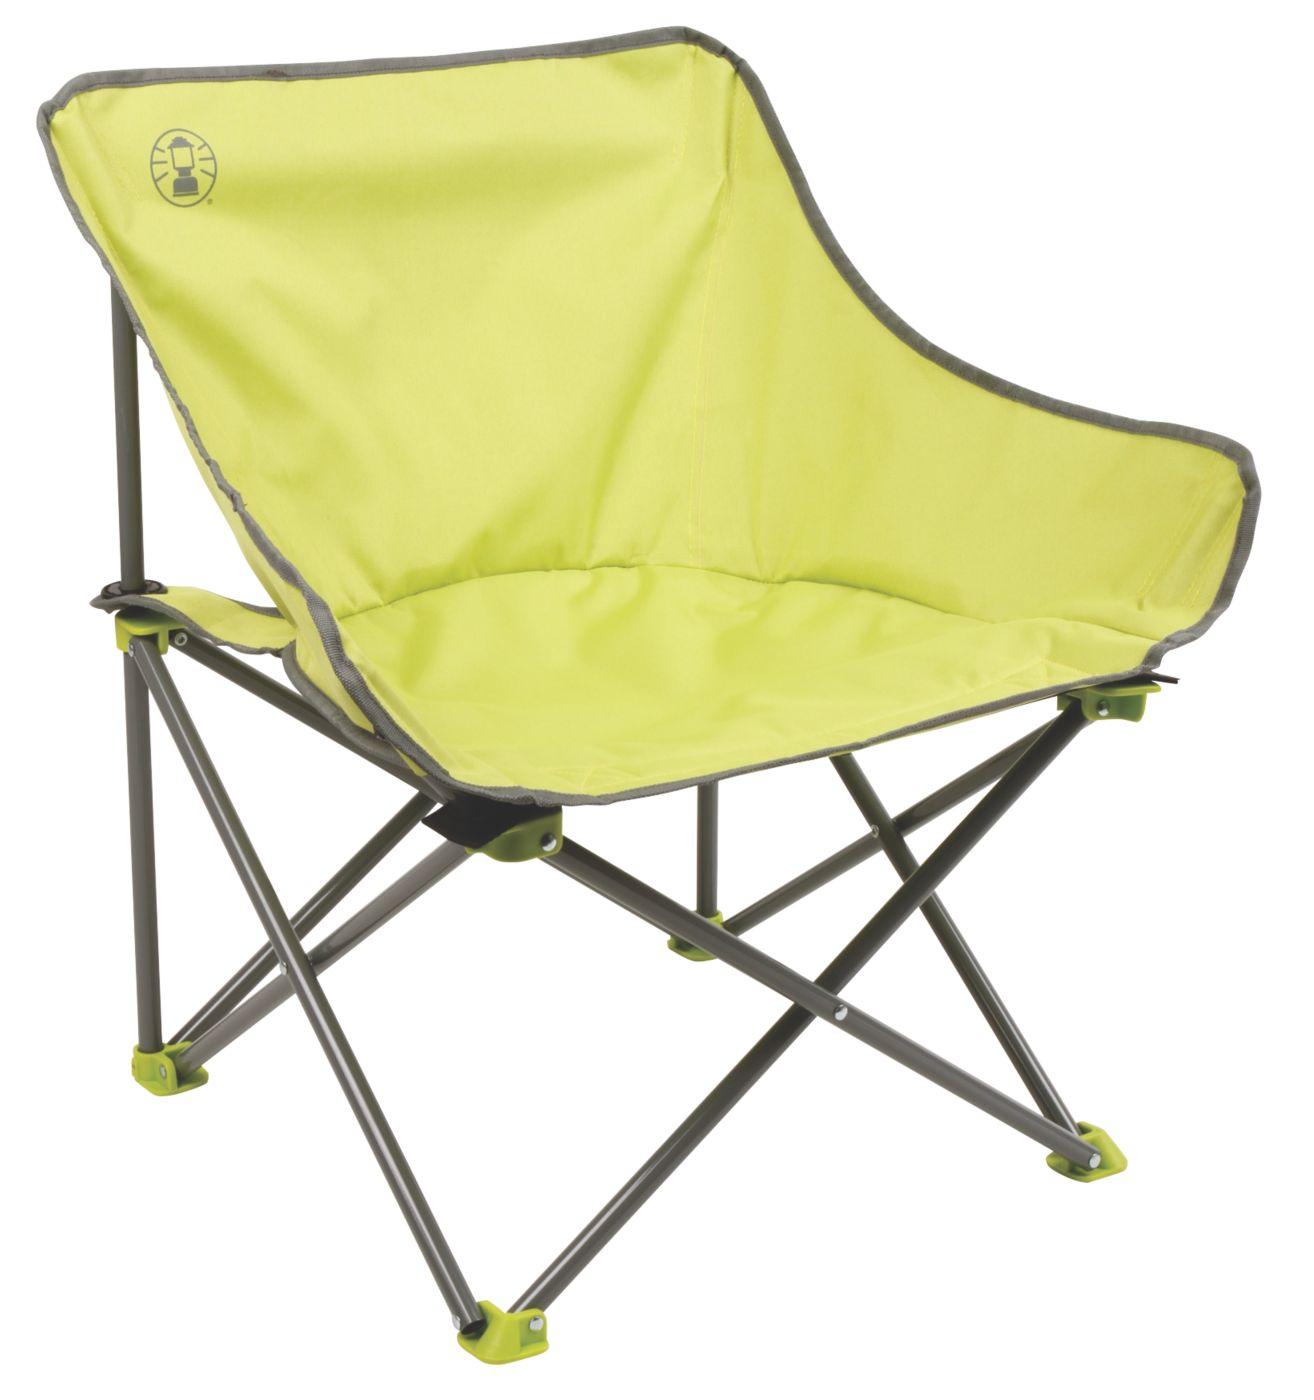 coleman rocking chair folding hinges camping chairs kickback